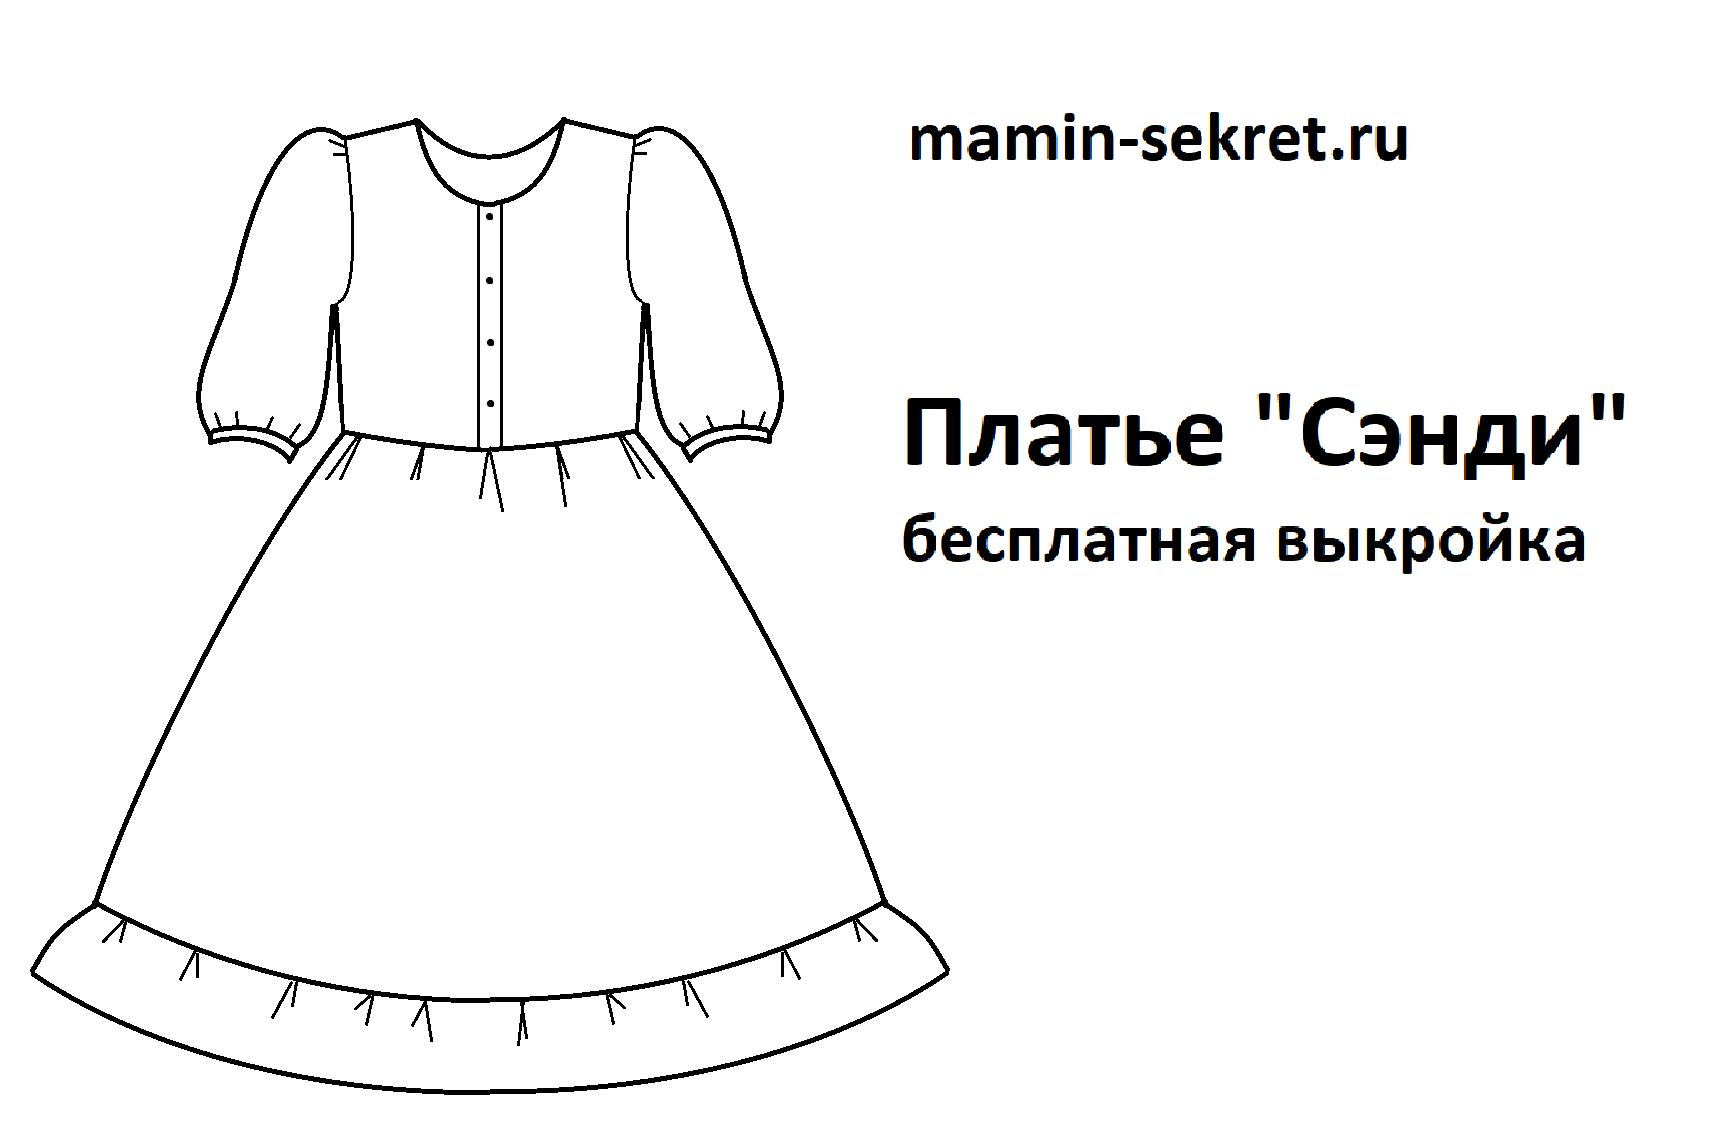 http://mamin-sekret.ru/image/catalog/catalog/sandy.png